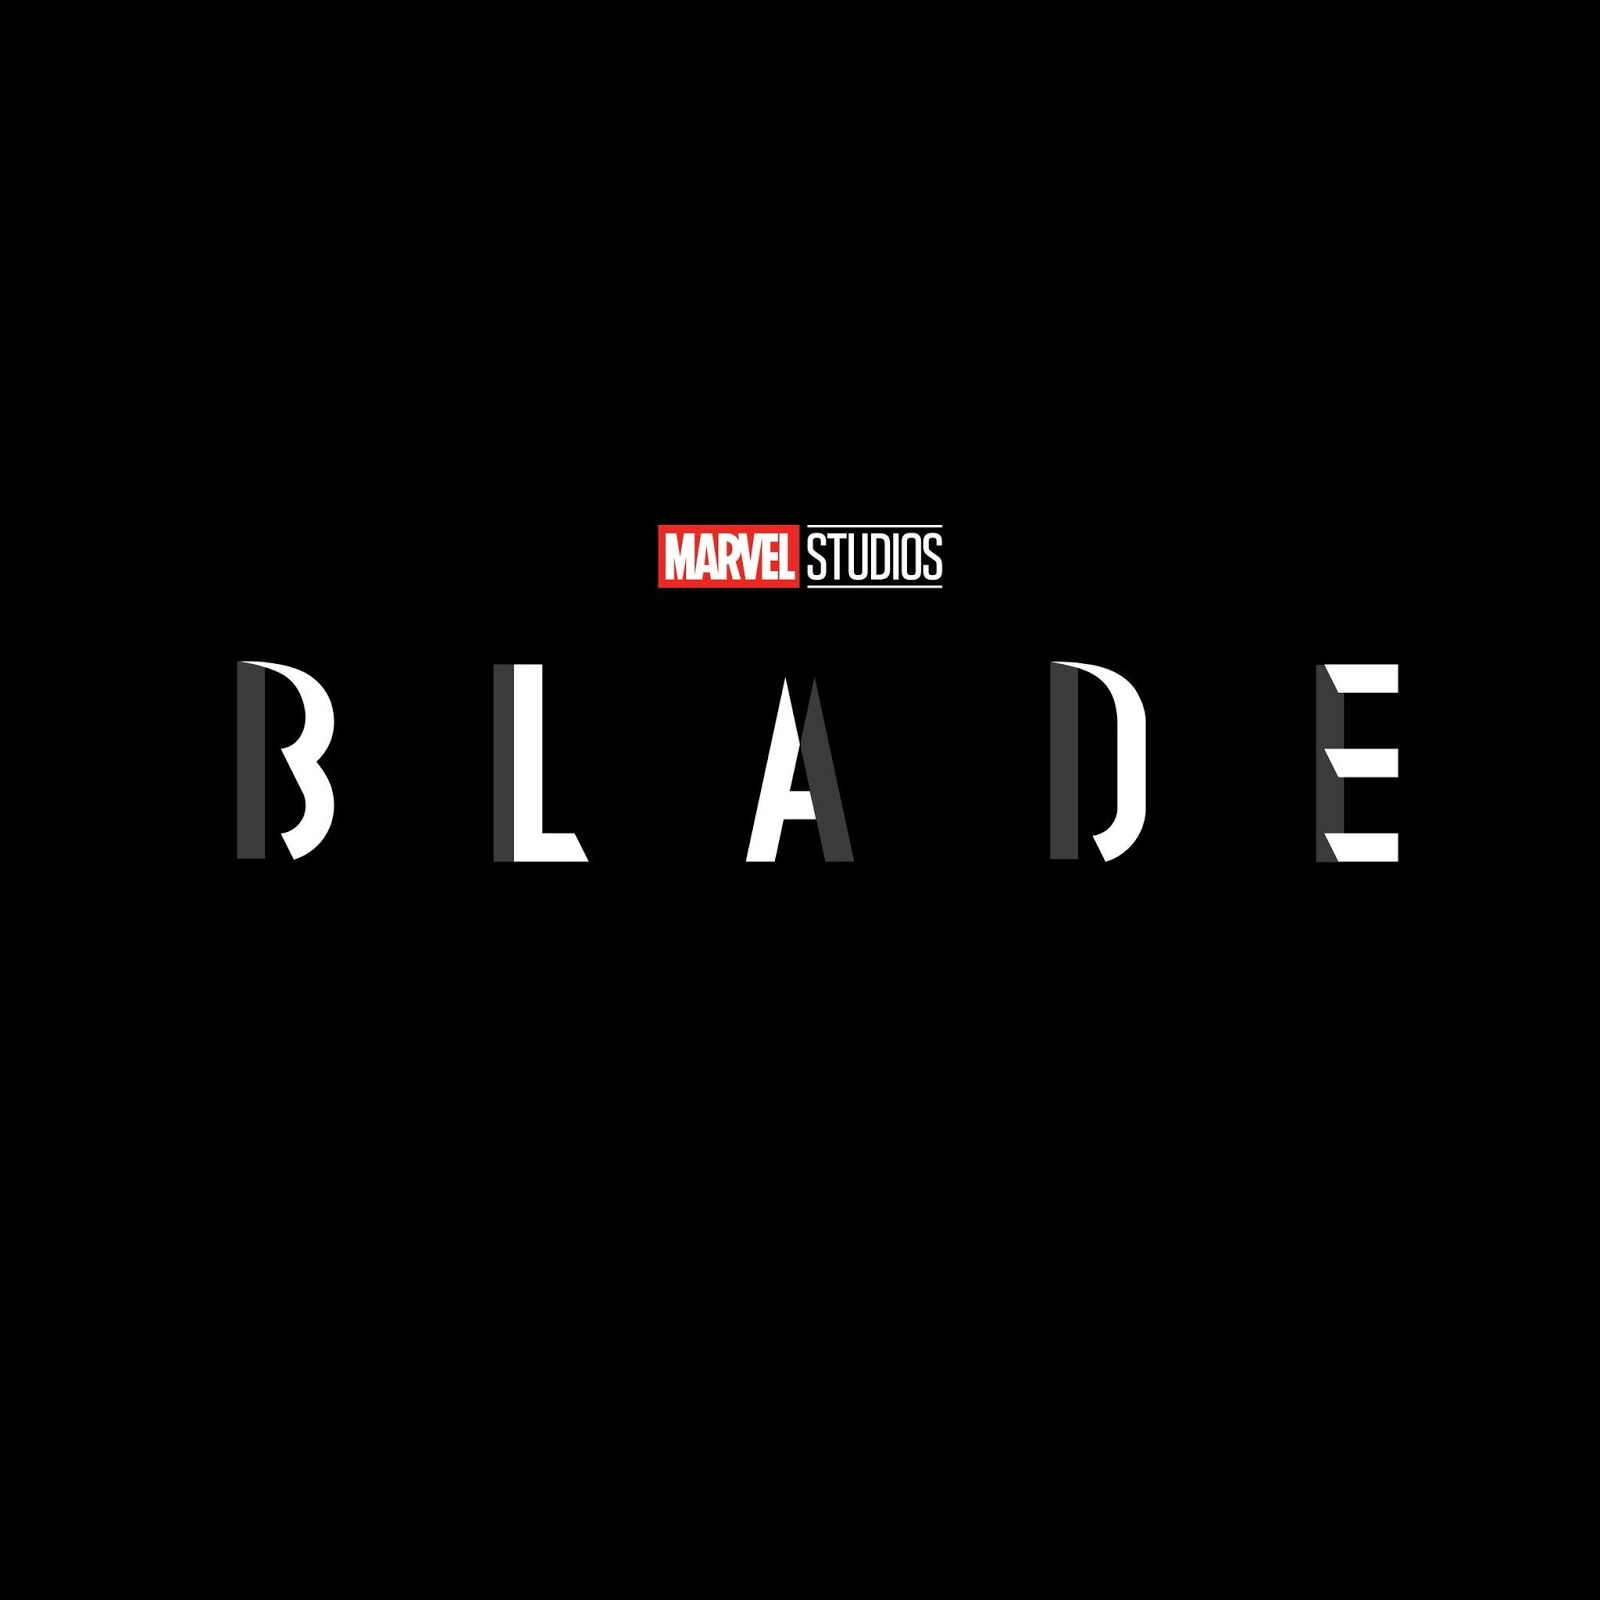 Marvel announces Blade, starring Mahershala Ali